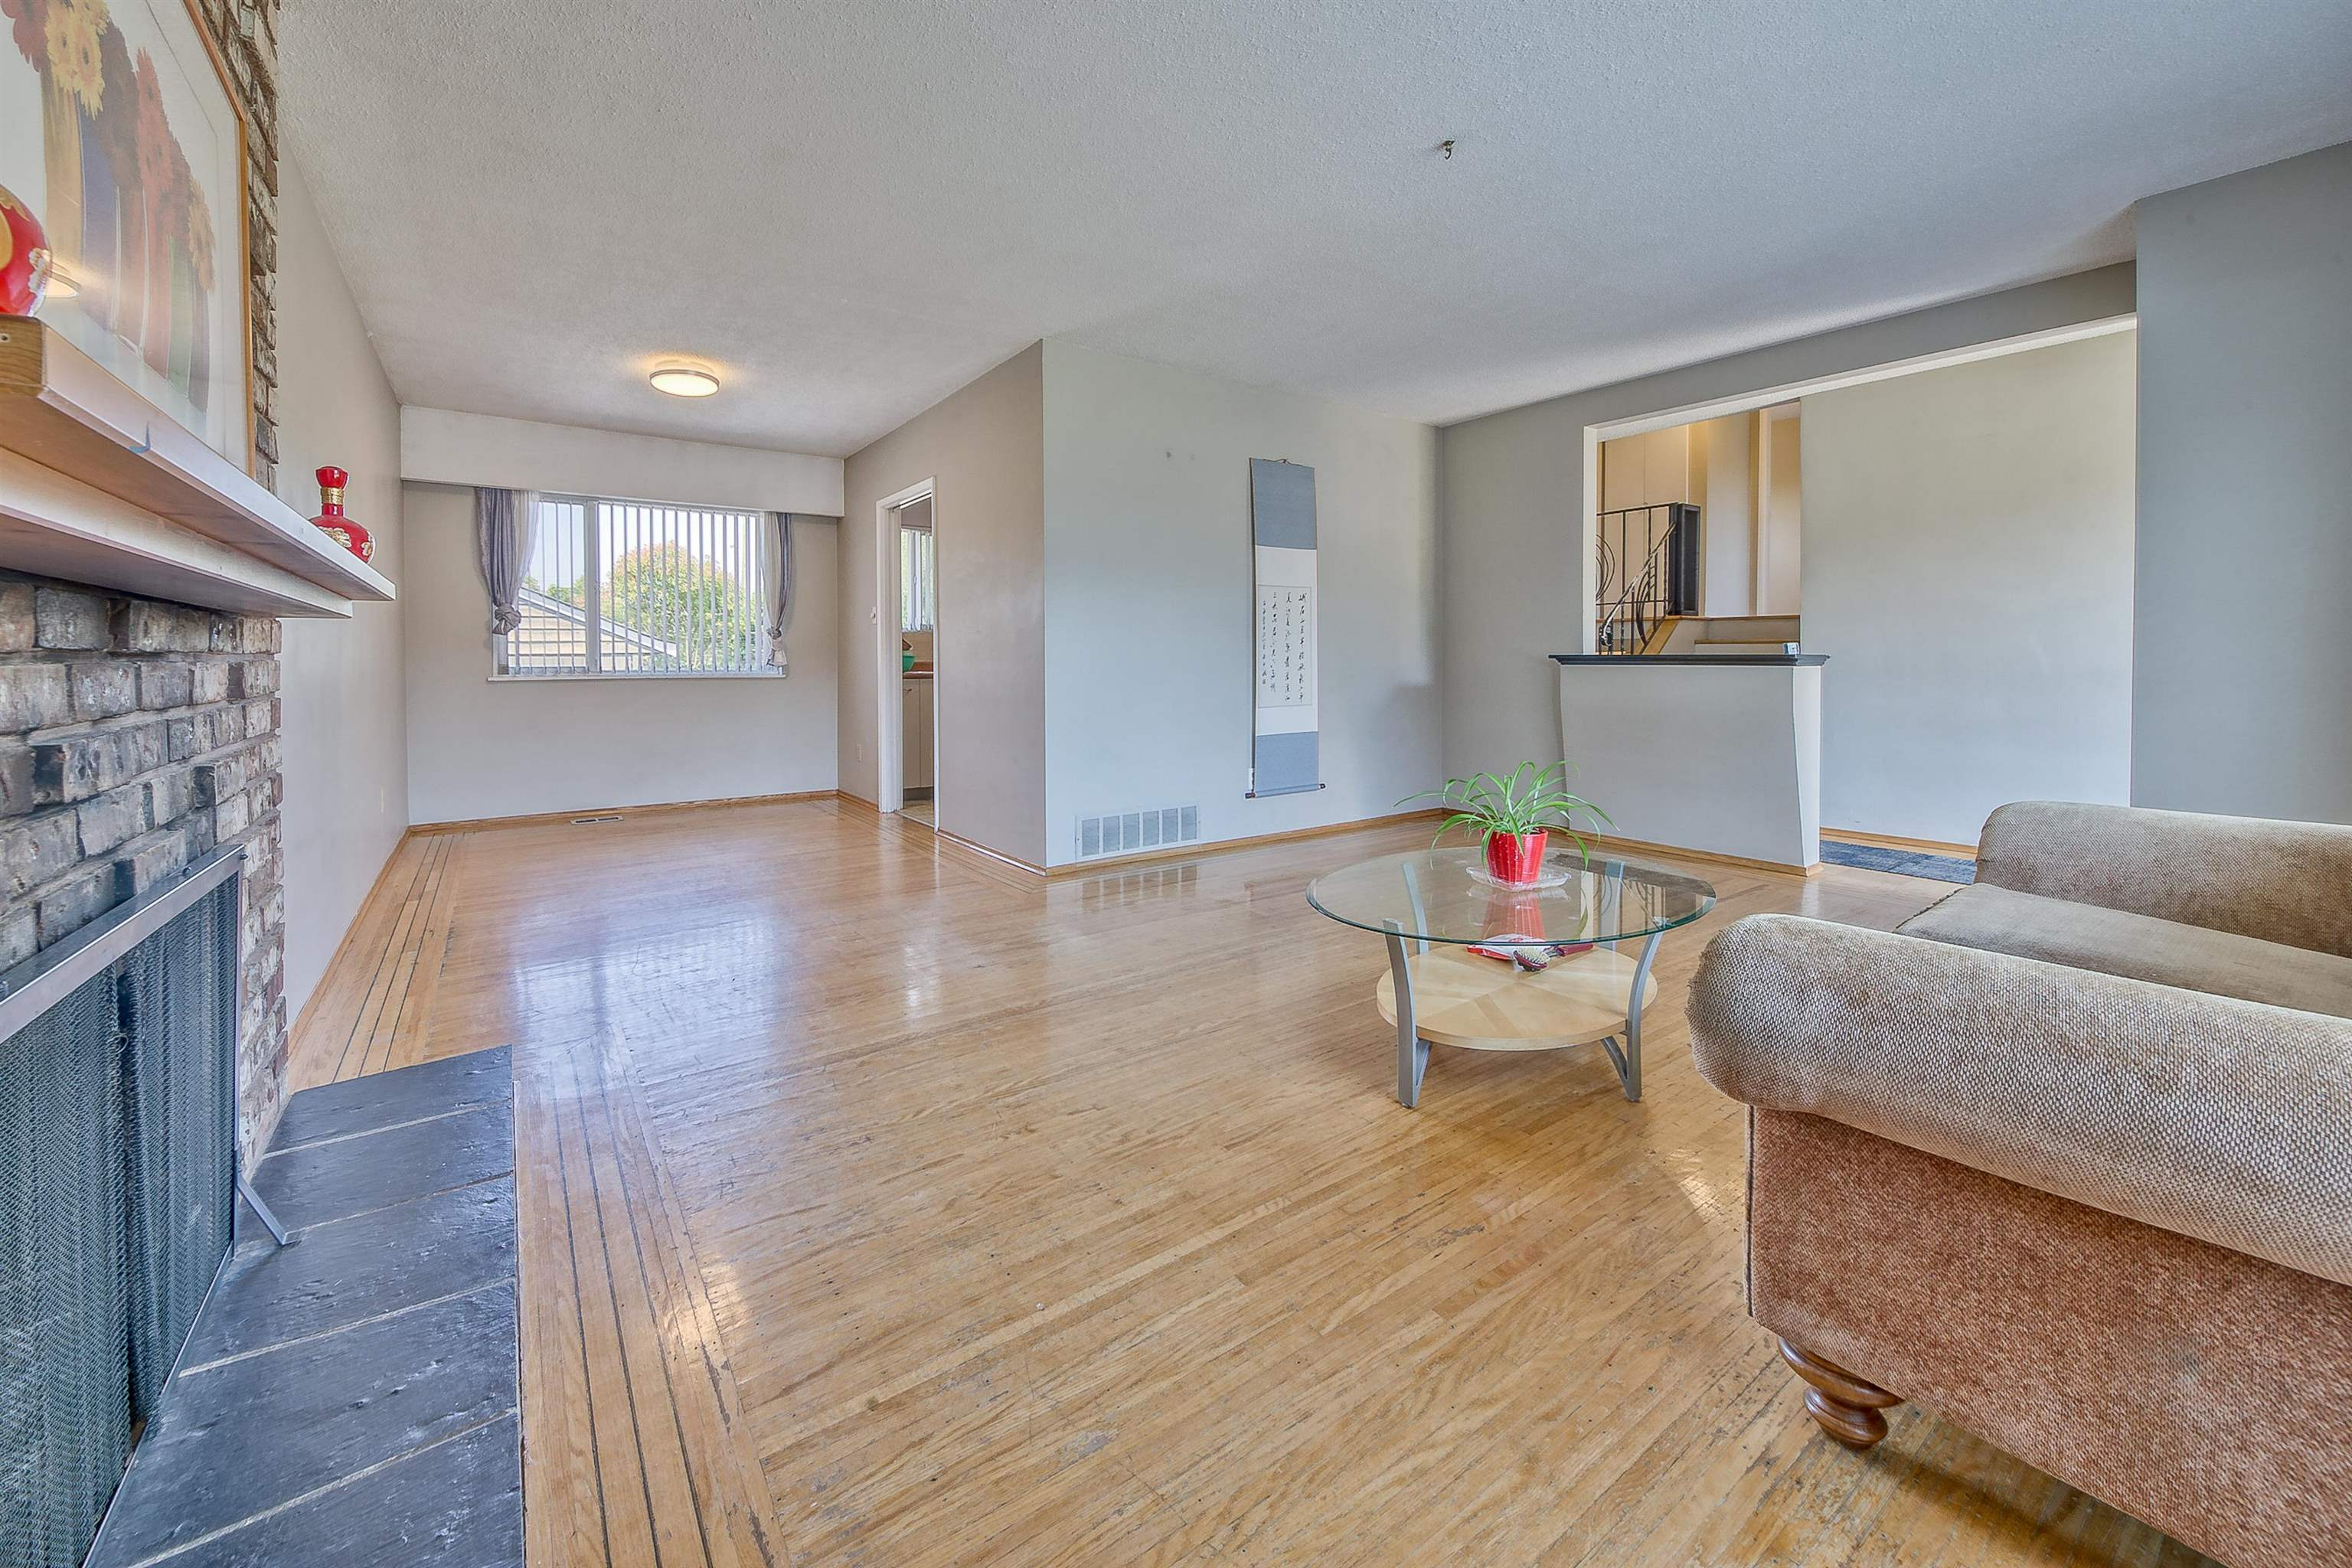 3311 BARMOND AVENUE - Seafair House/Single Family for sale, 5 Bedrooms (R2624038)